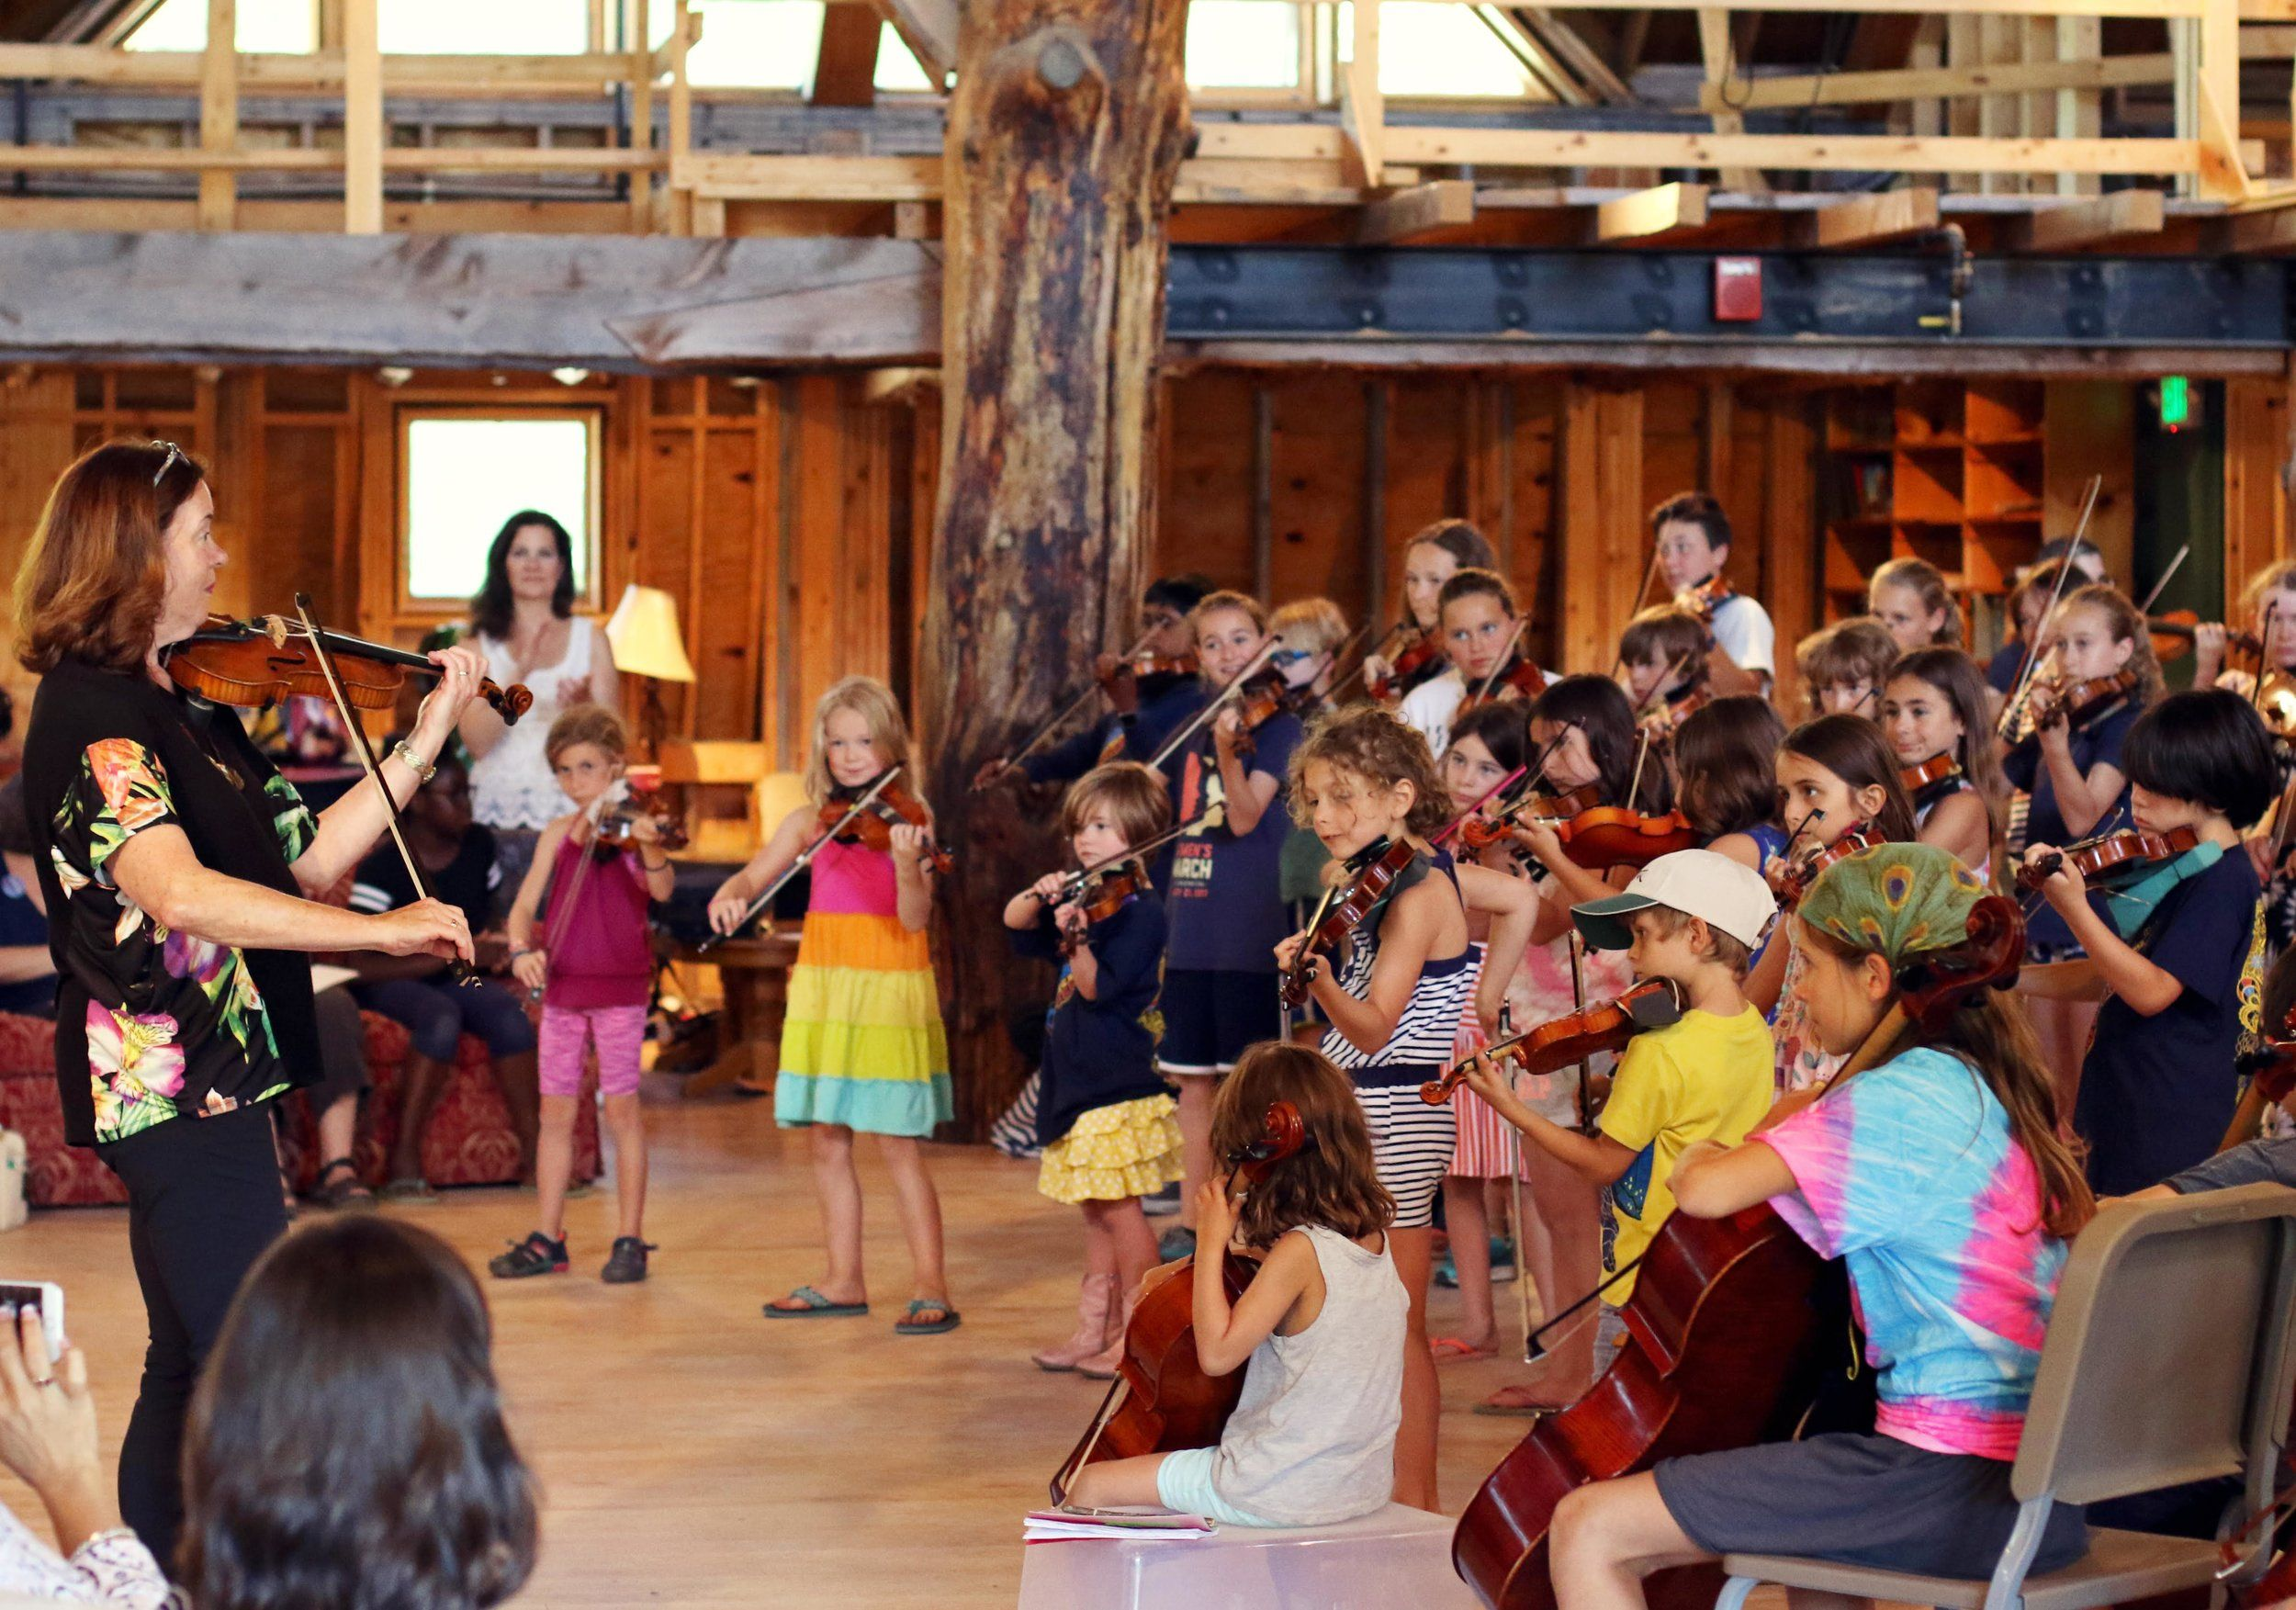 Ogontz Suzuki Institute Ogontz Camp And Events Center Lyman Nh How To Memorize Things Recital Event Center